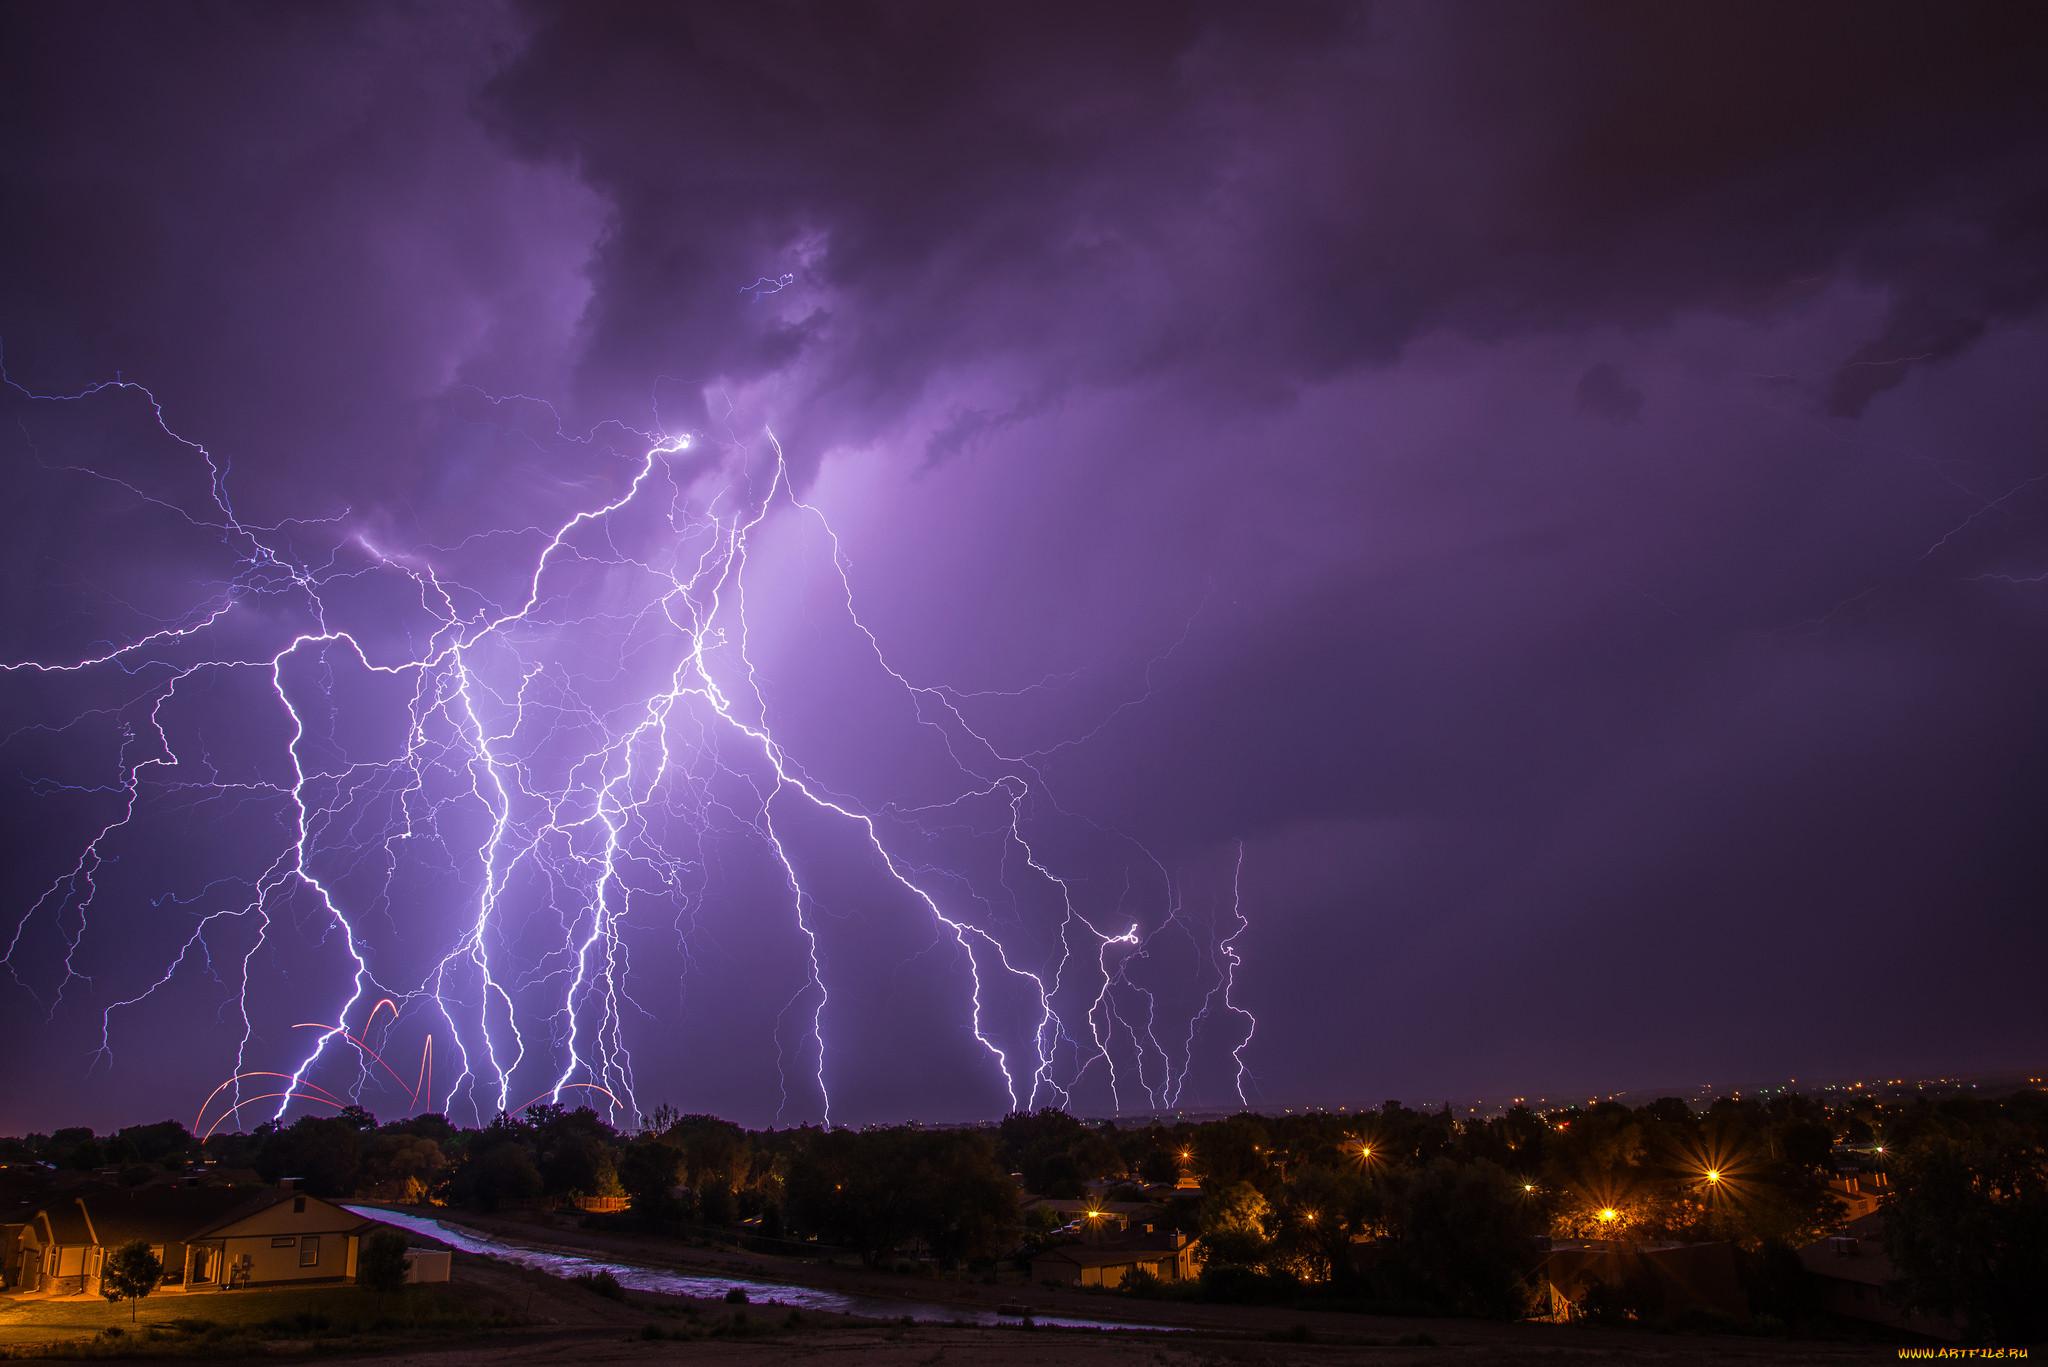 Молния и гроза. описание, фото, причины и последствия